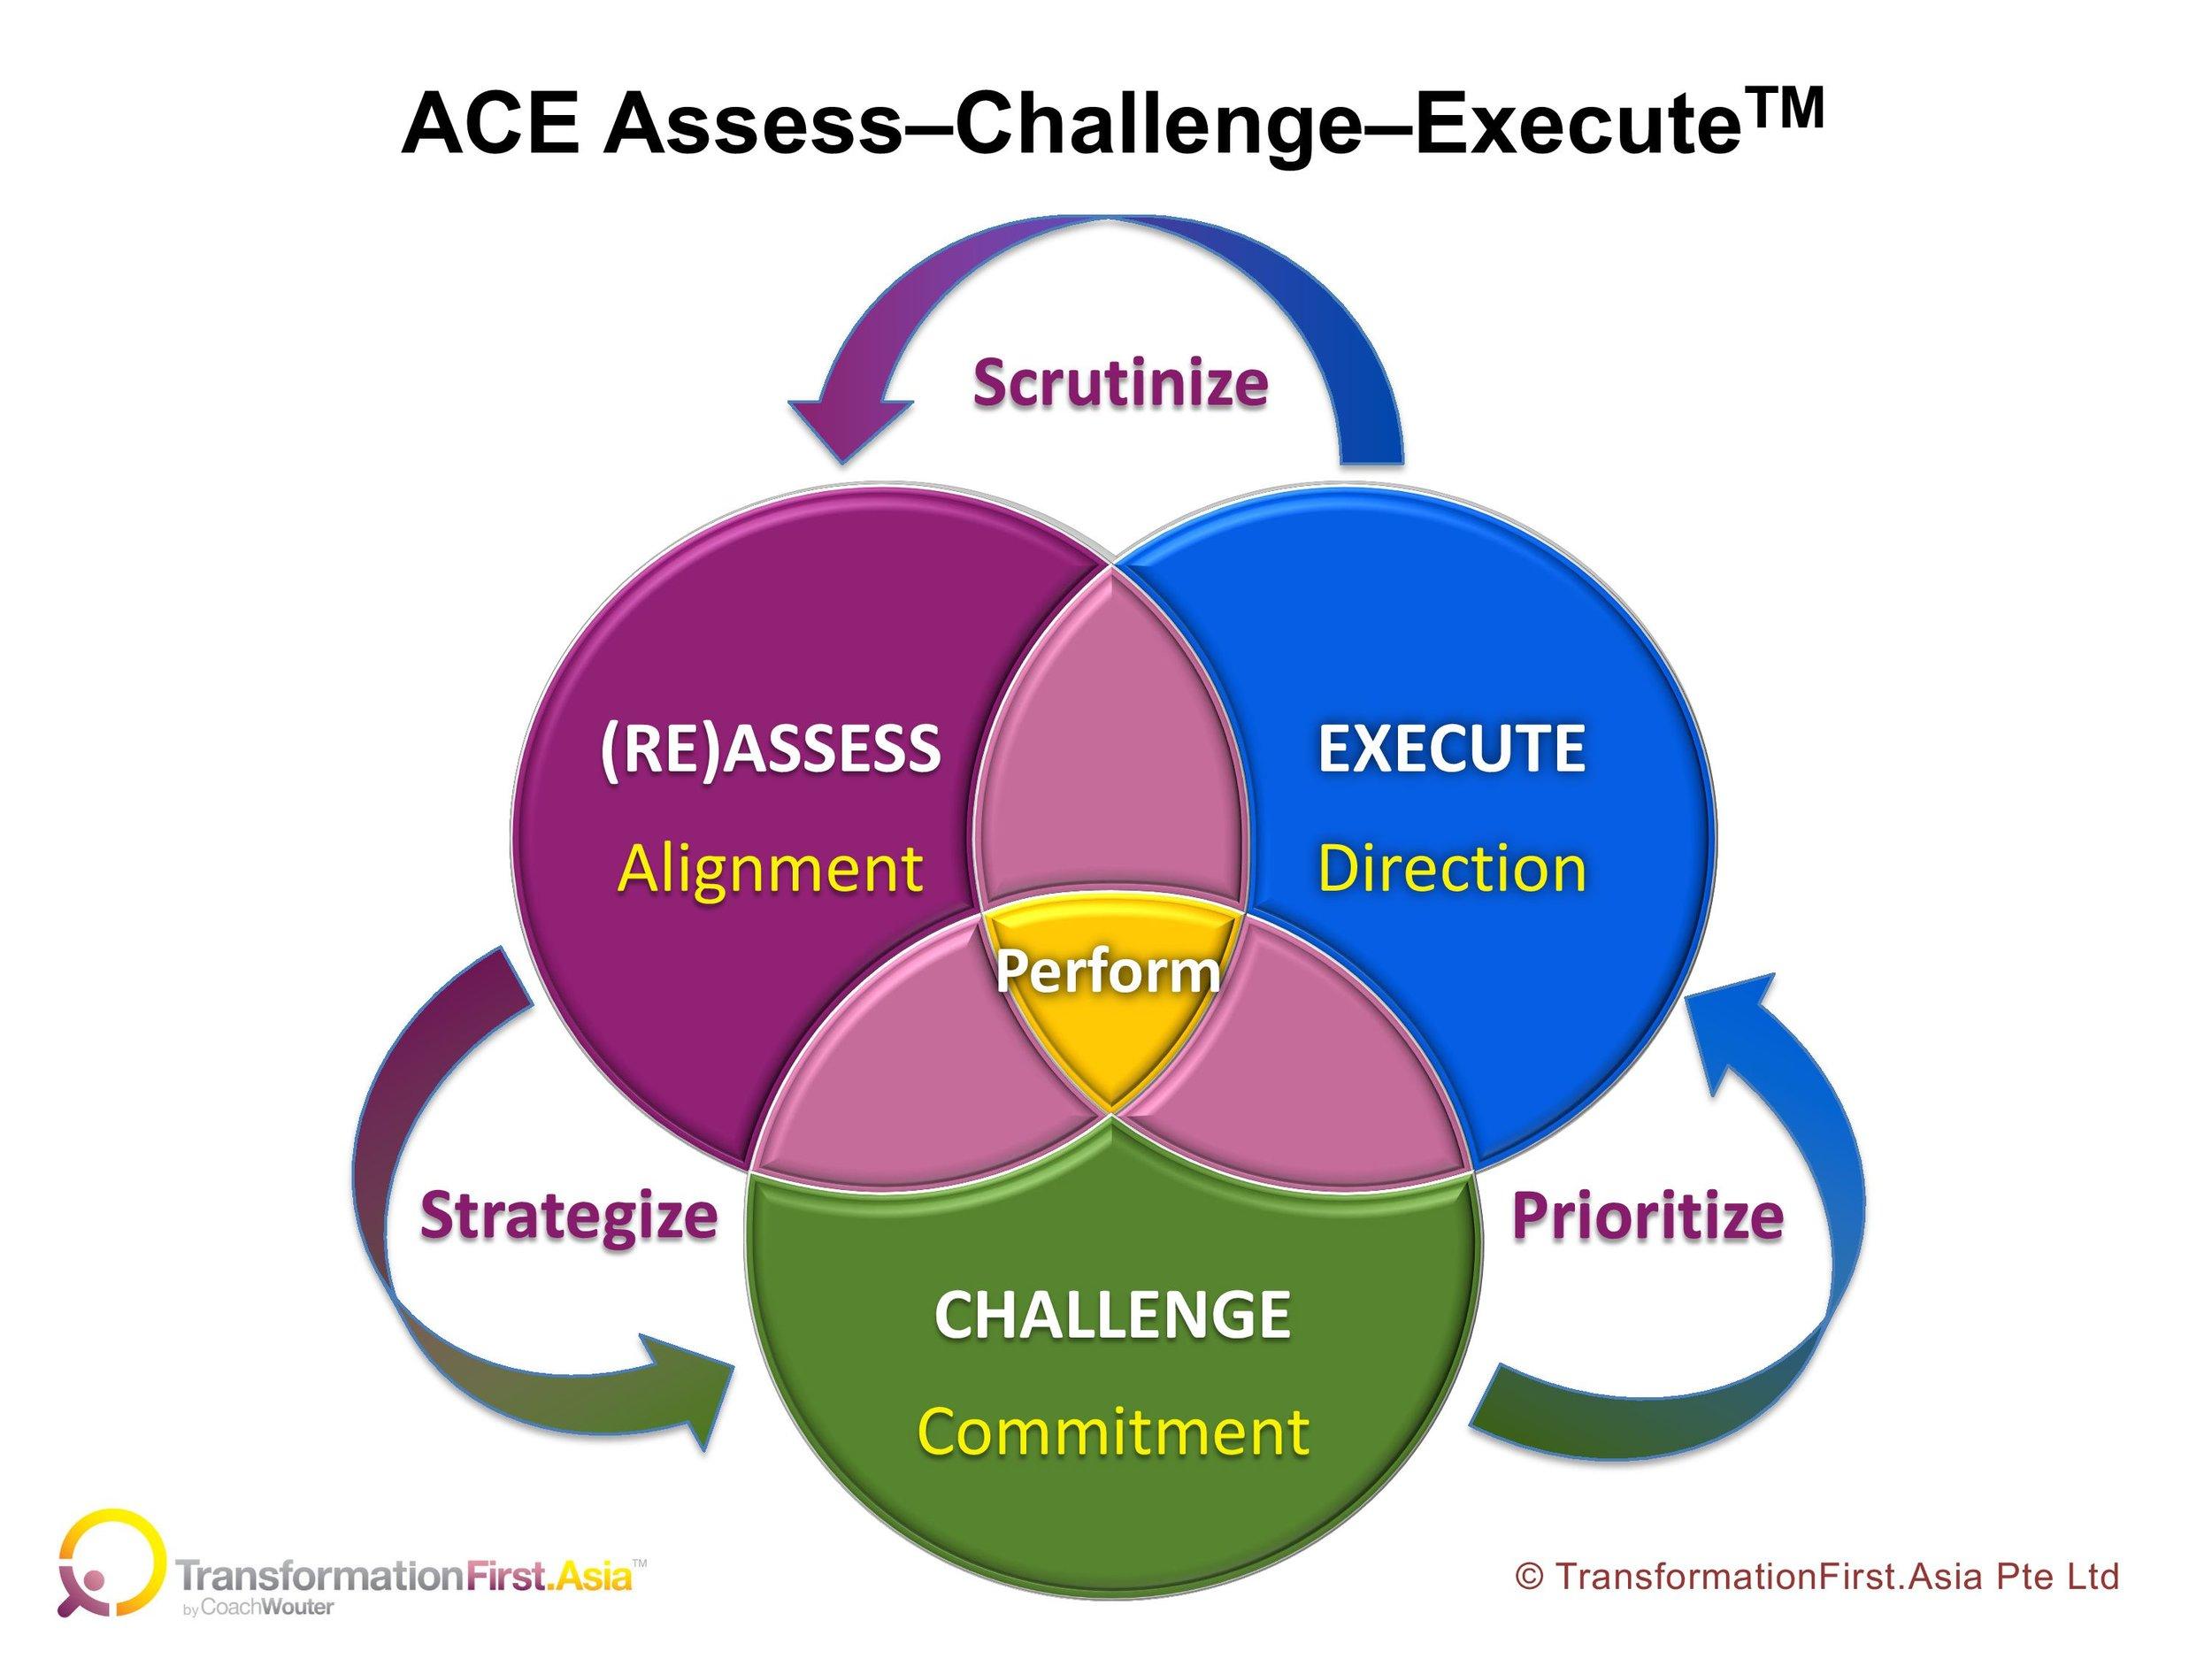 ACE Assess Challenge Execute.jpg